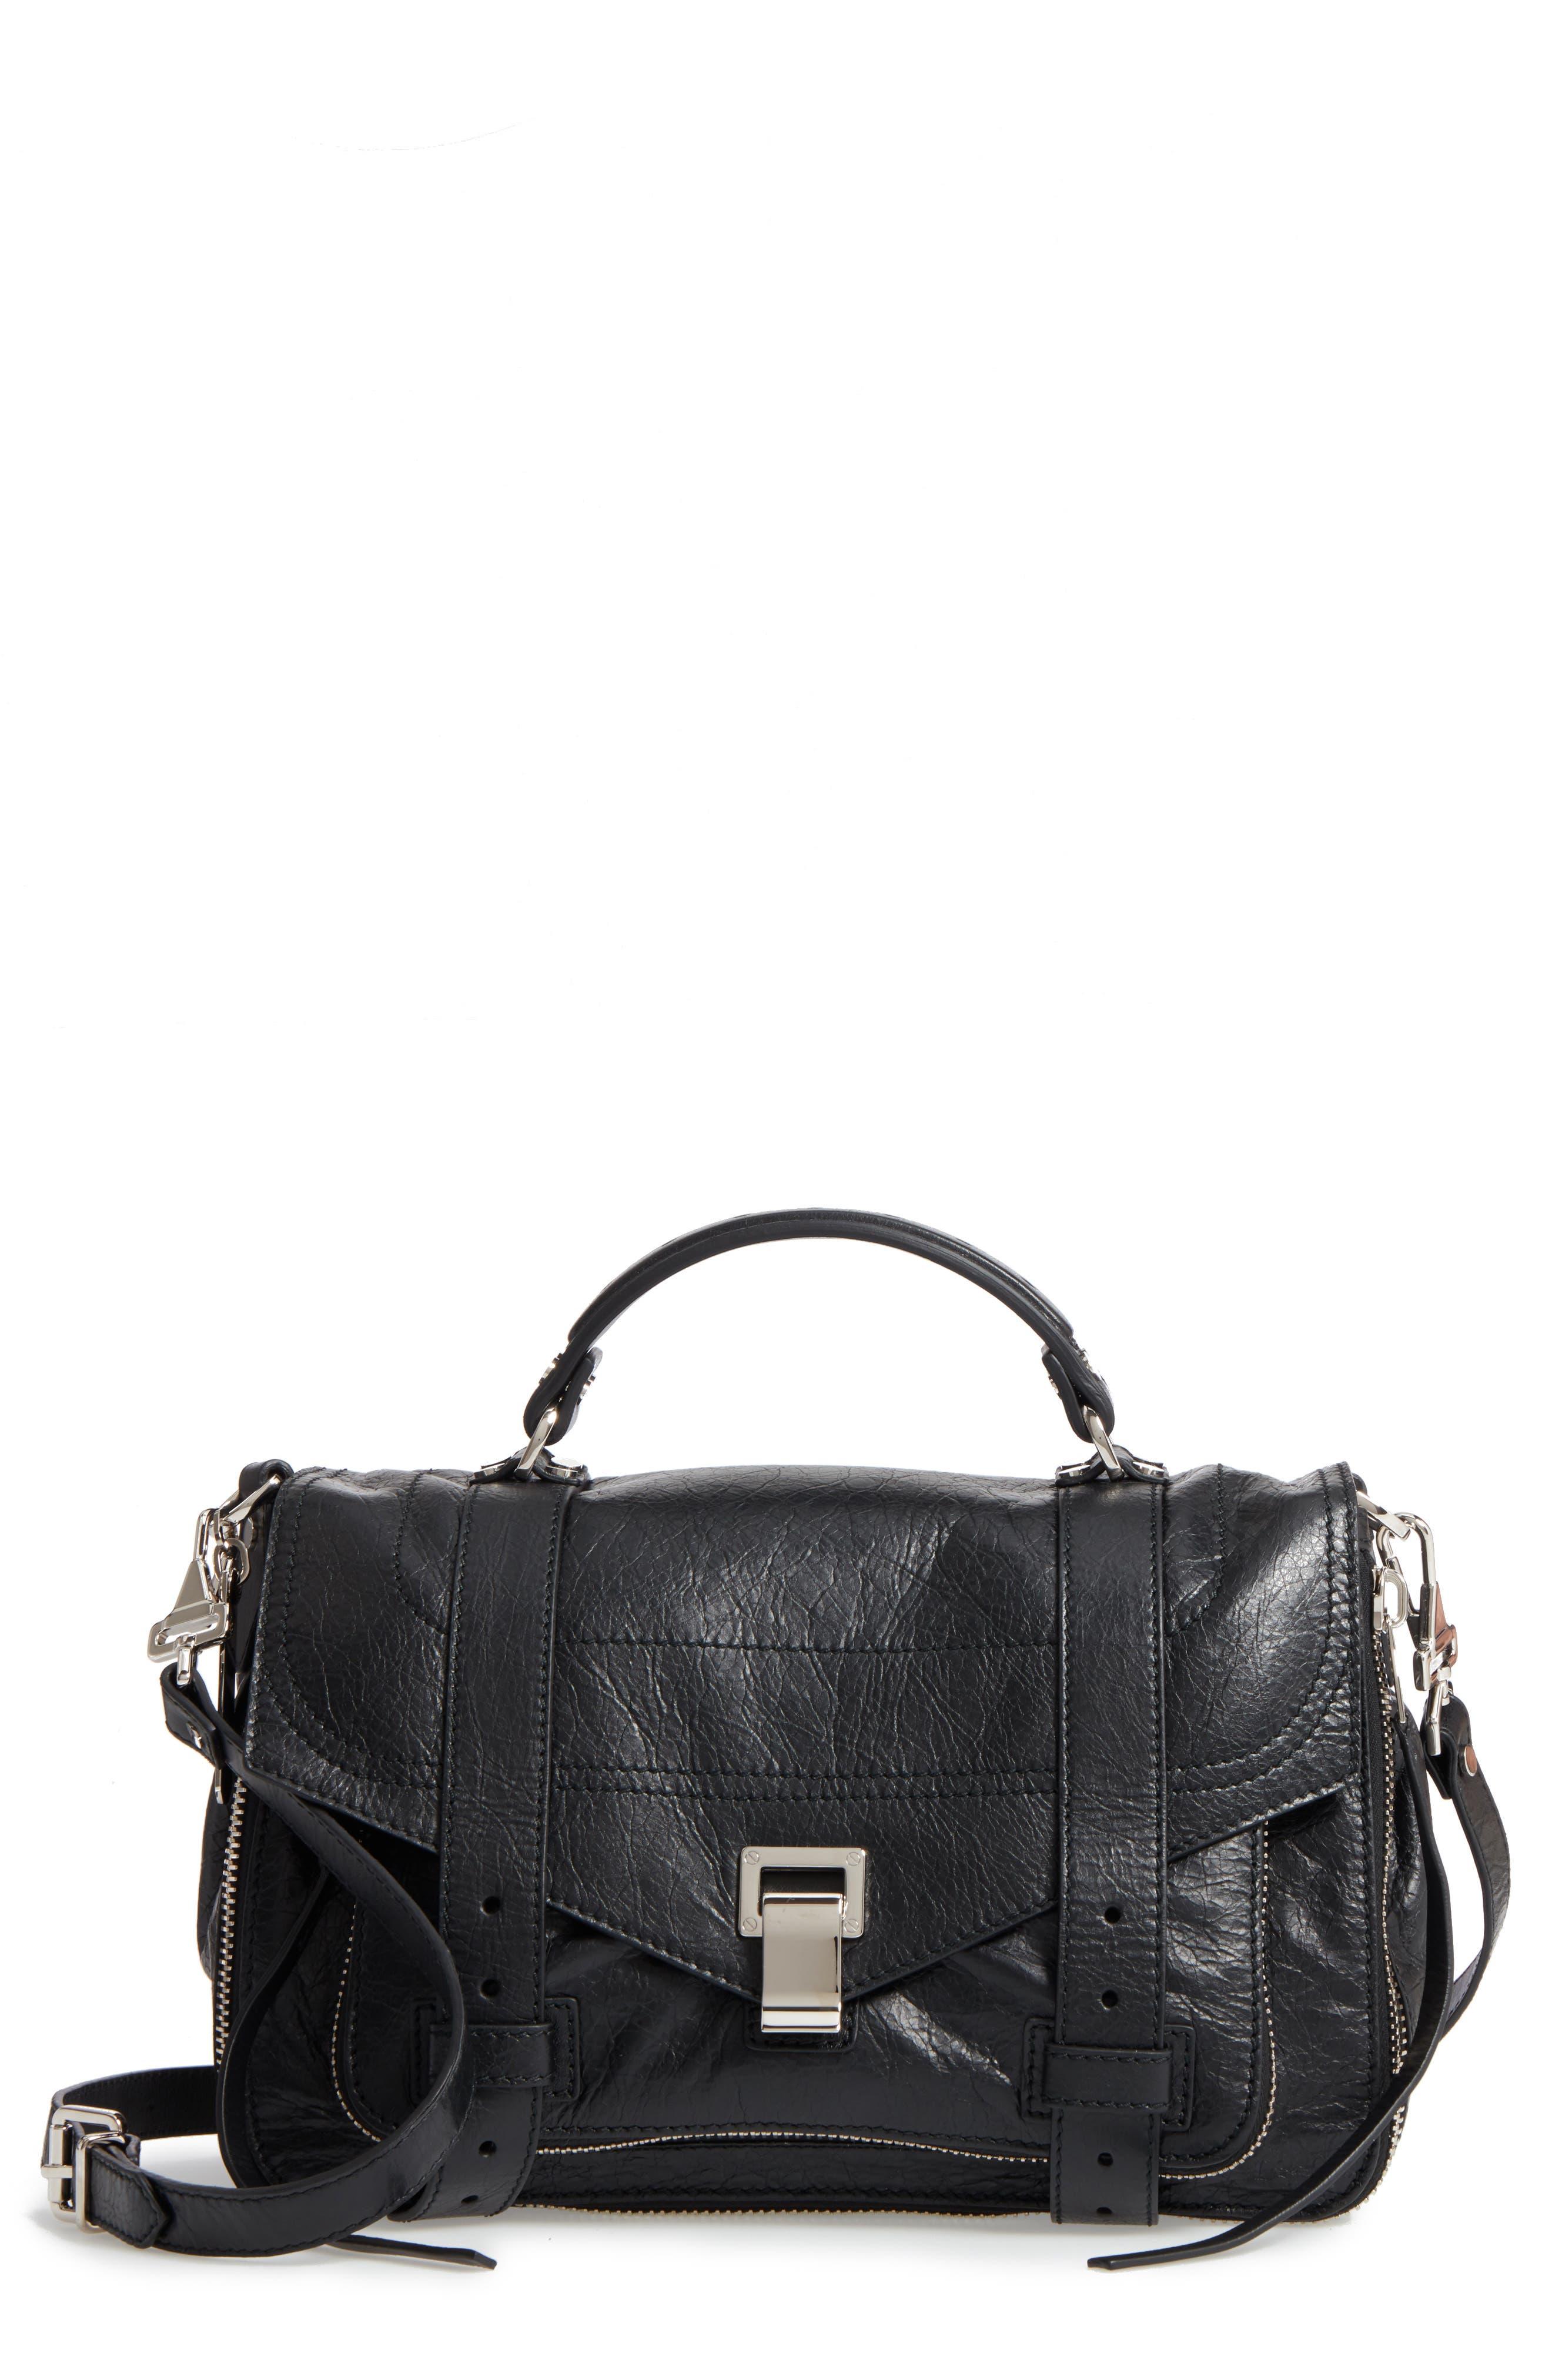 Medium PS1 Paper Leather Satchel,                             Main thumbnail 1, color,                             BLACK